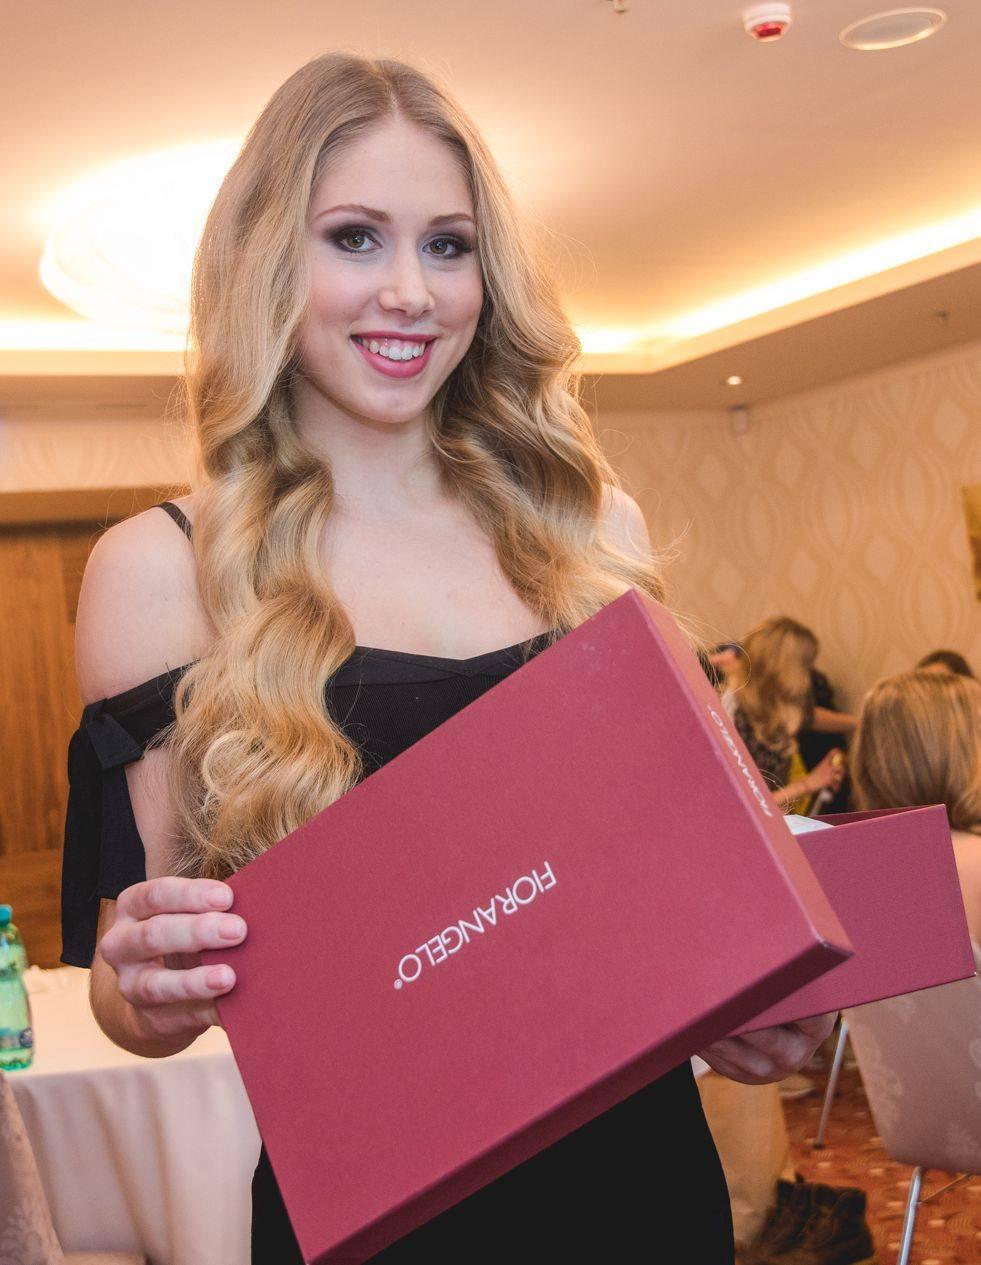 Miss Slovensko 2019 is Frederika Kurtulikova 51748910